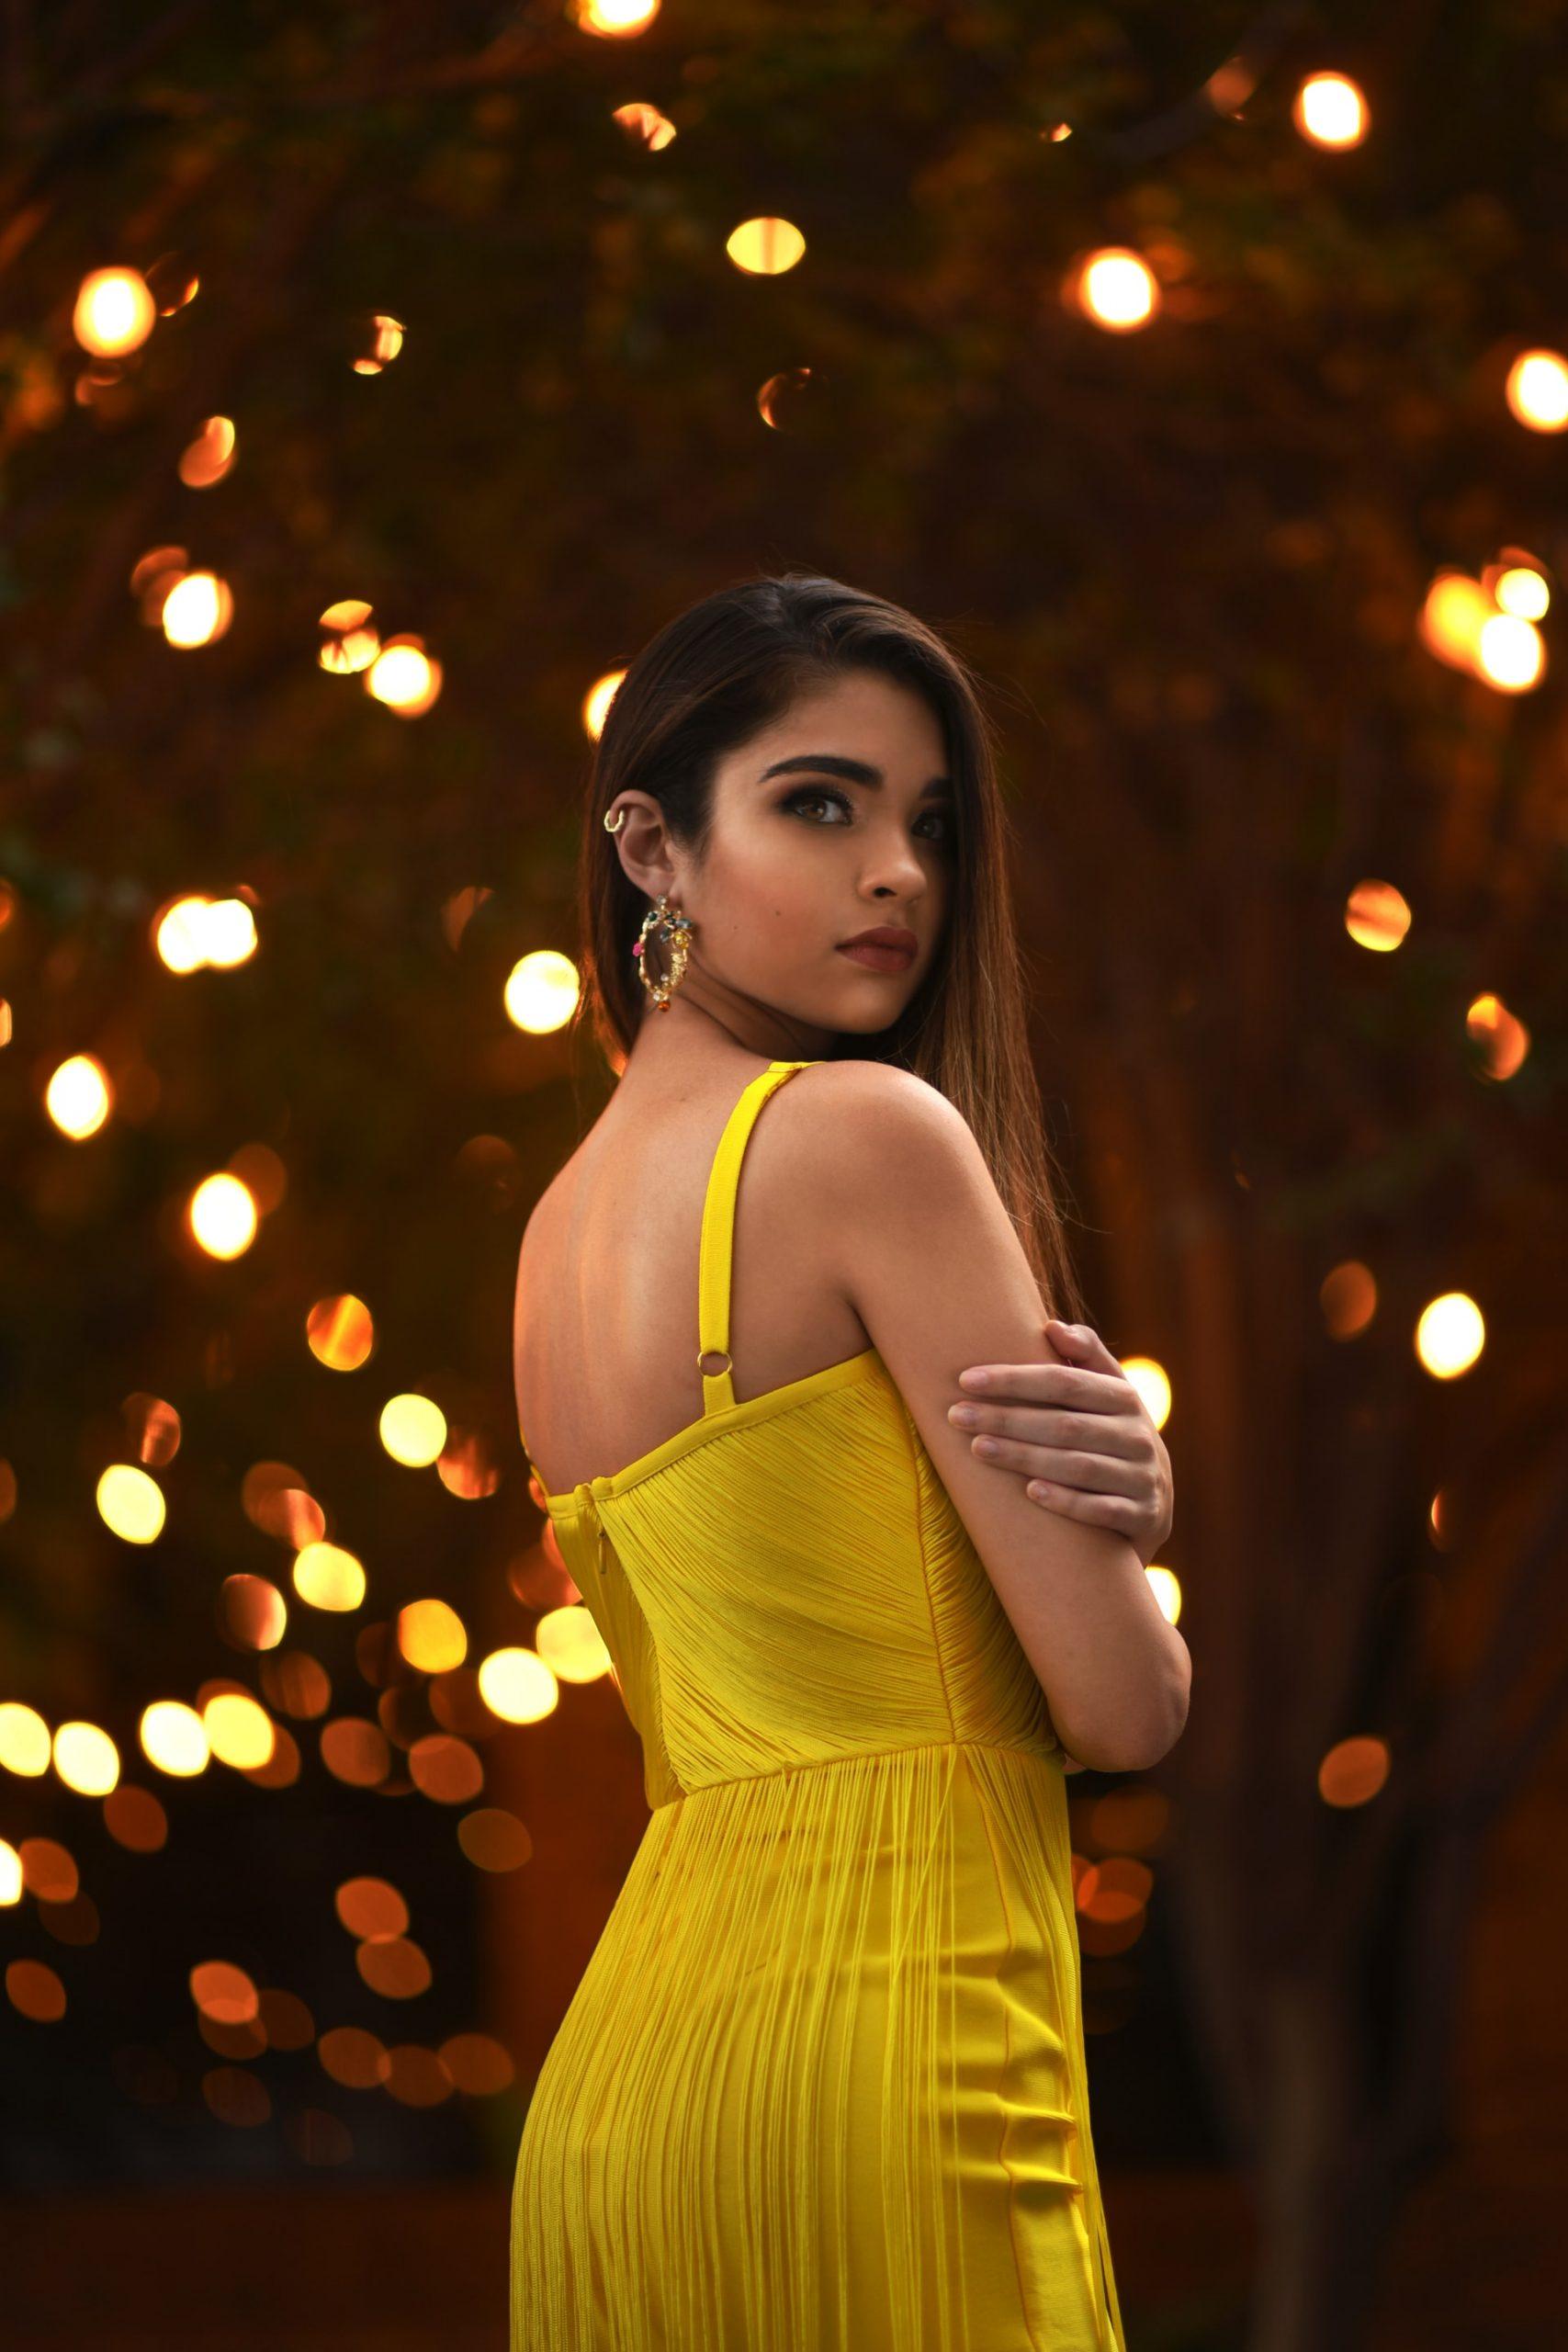 woman-yellow-dress